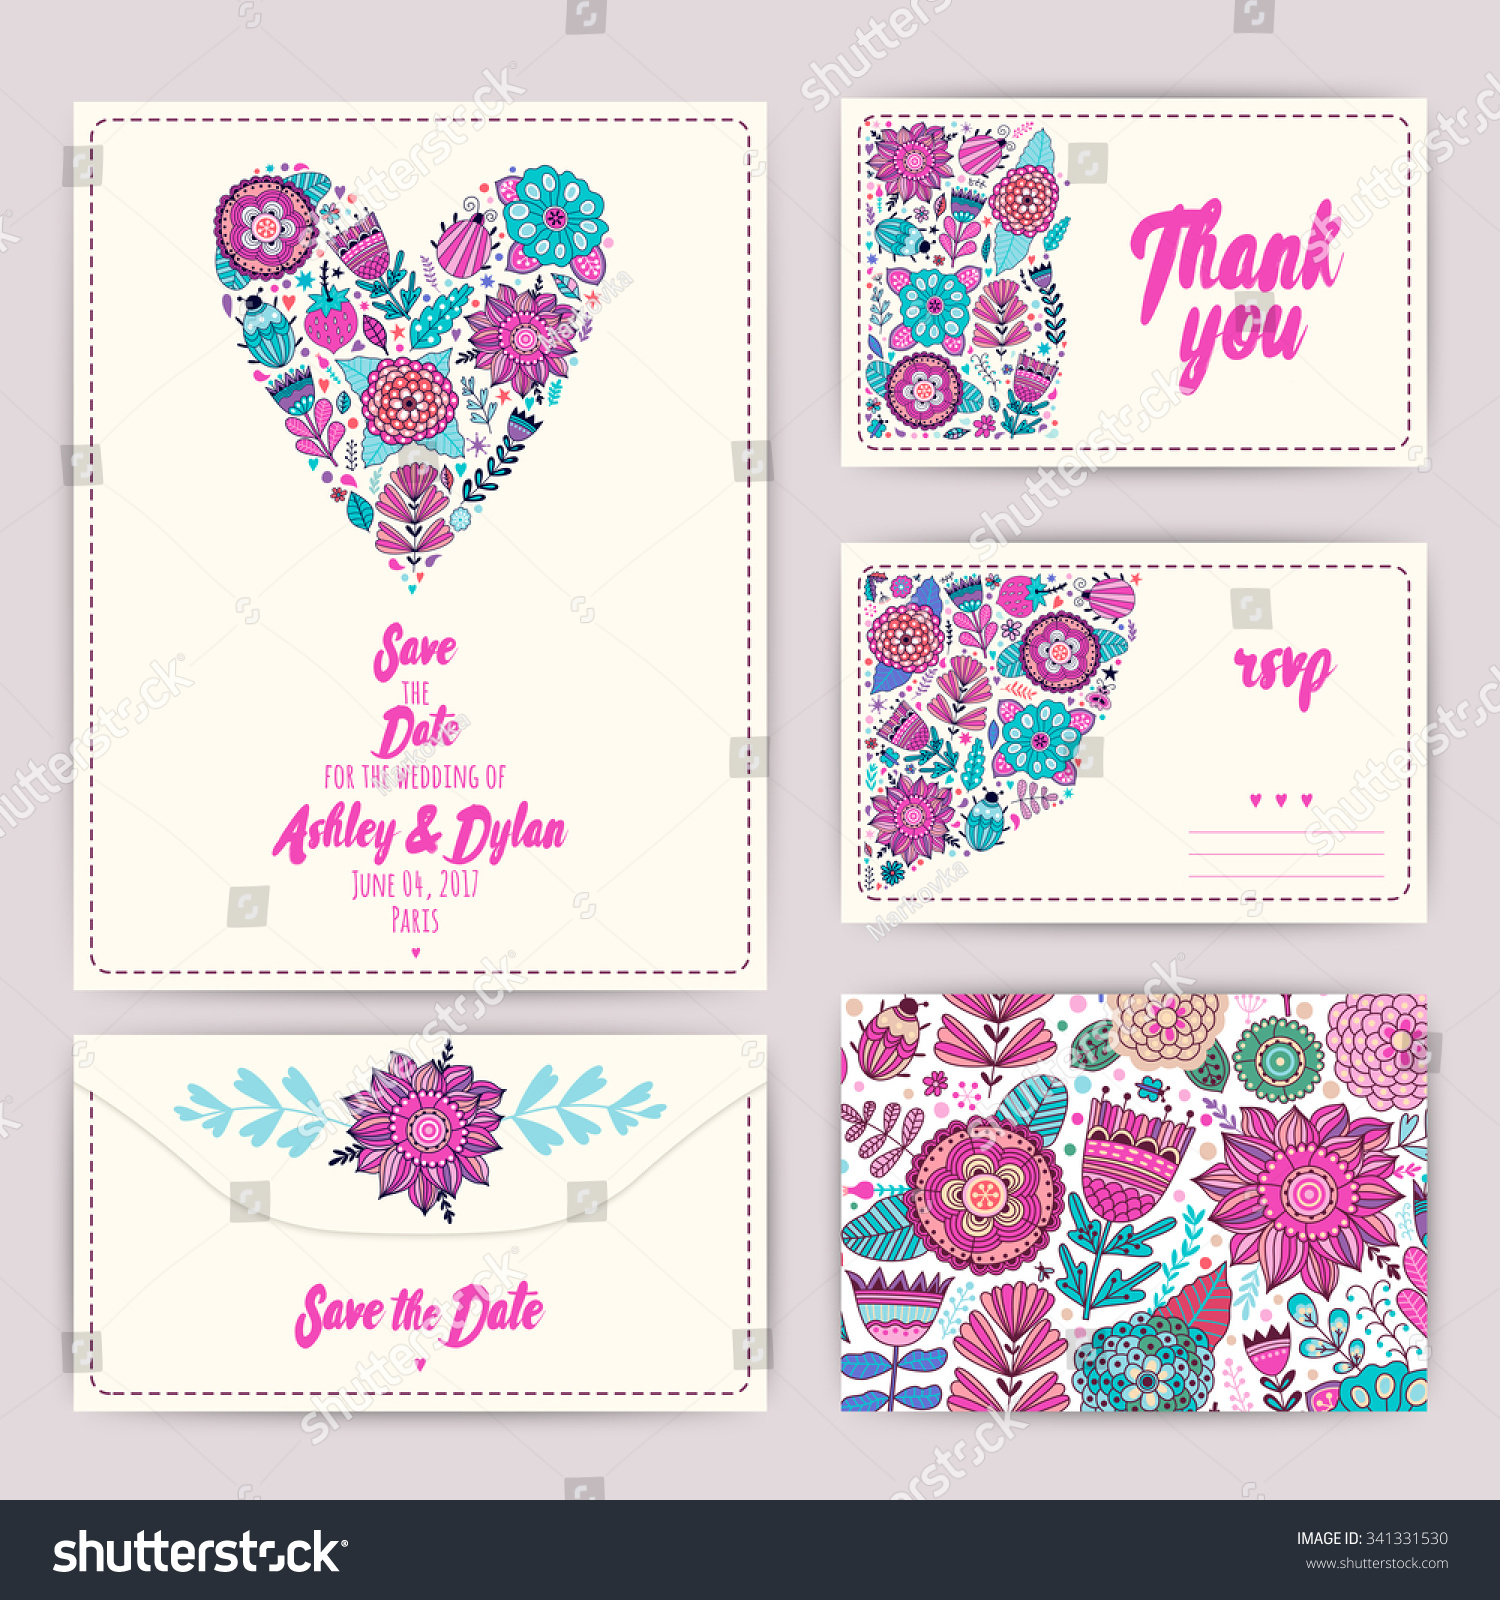 Wedding Invitation Template Invitation Envelope Thank Stock Vector ...